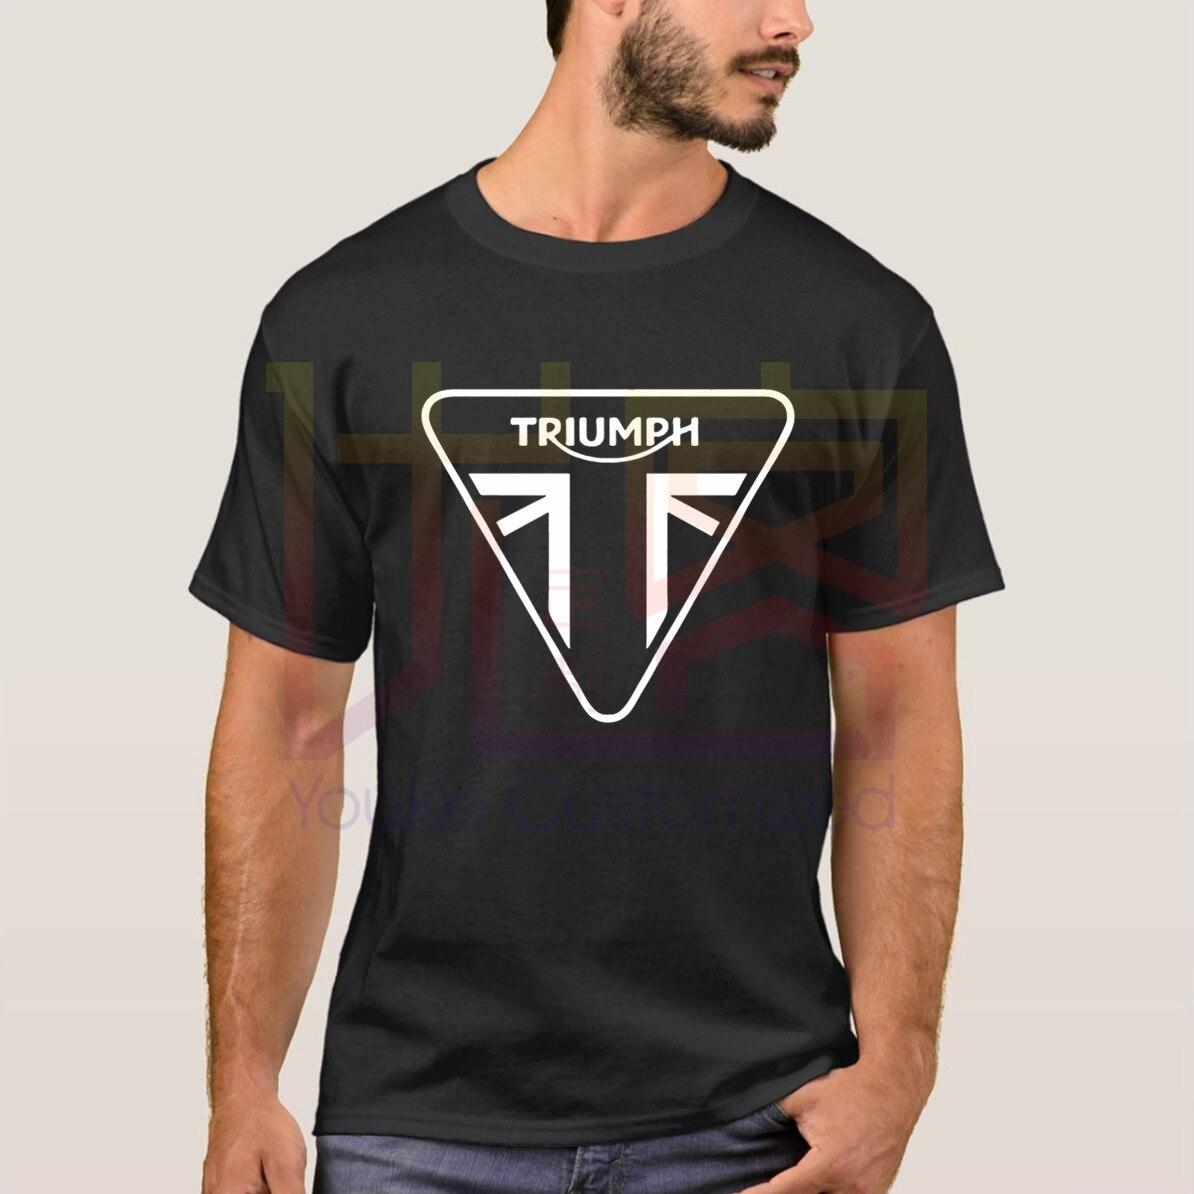 Camiseta Casual para hombre, camiseta de manga corta con logotipo de moto Triumph, camiseta Original estampada de talla grande Xxxl, camiseta para hombre